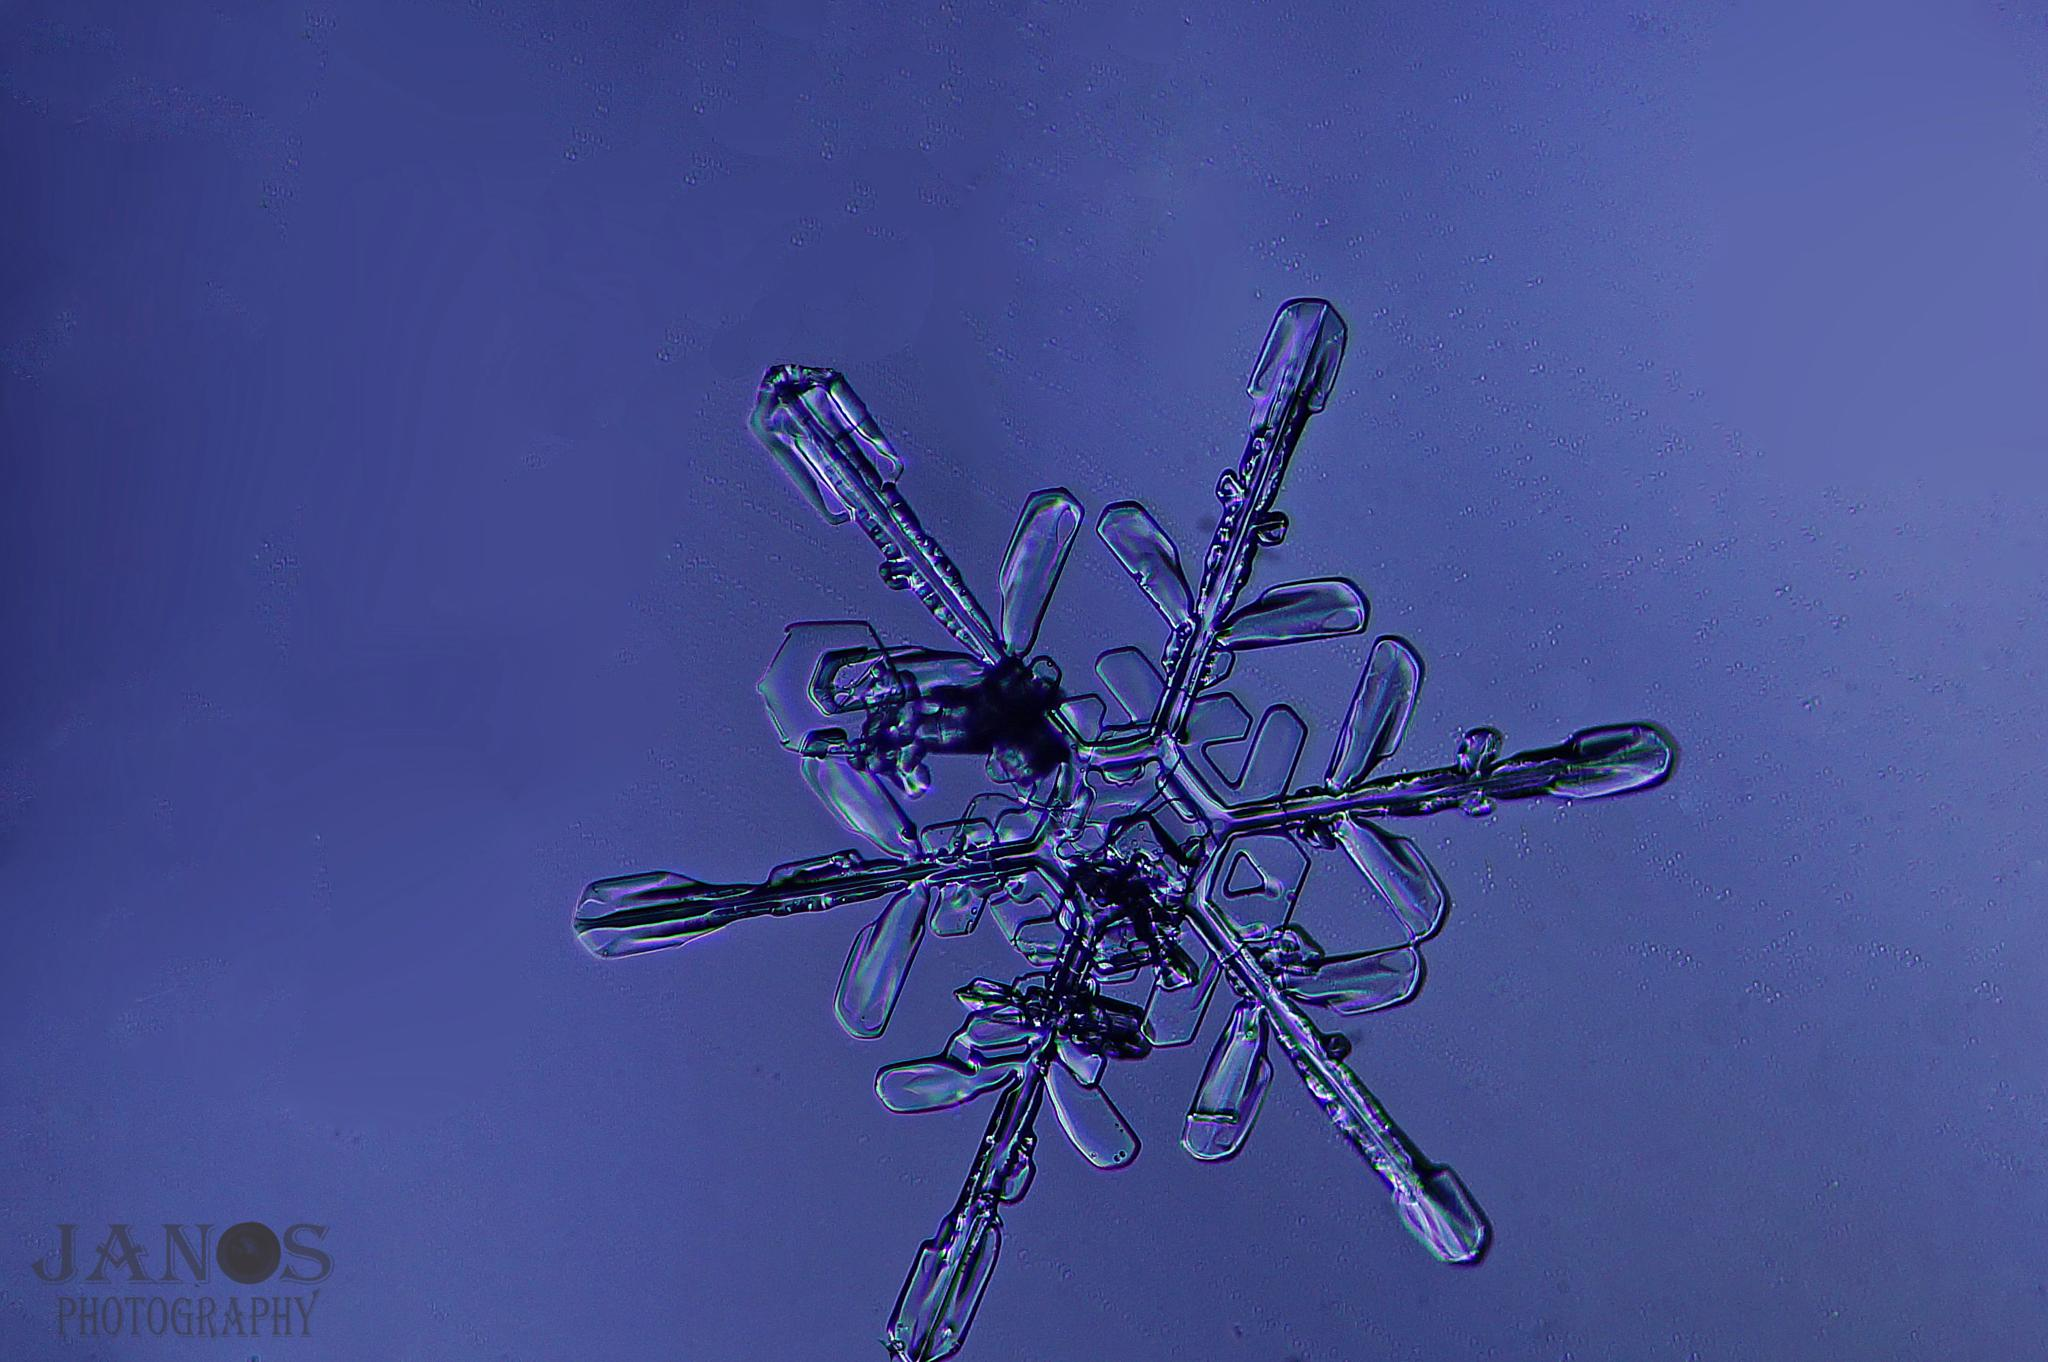 snowflake by Jan Ove Skjerping